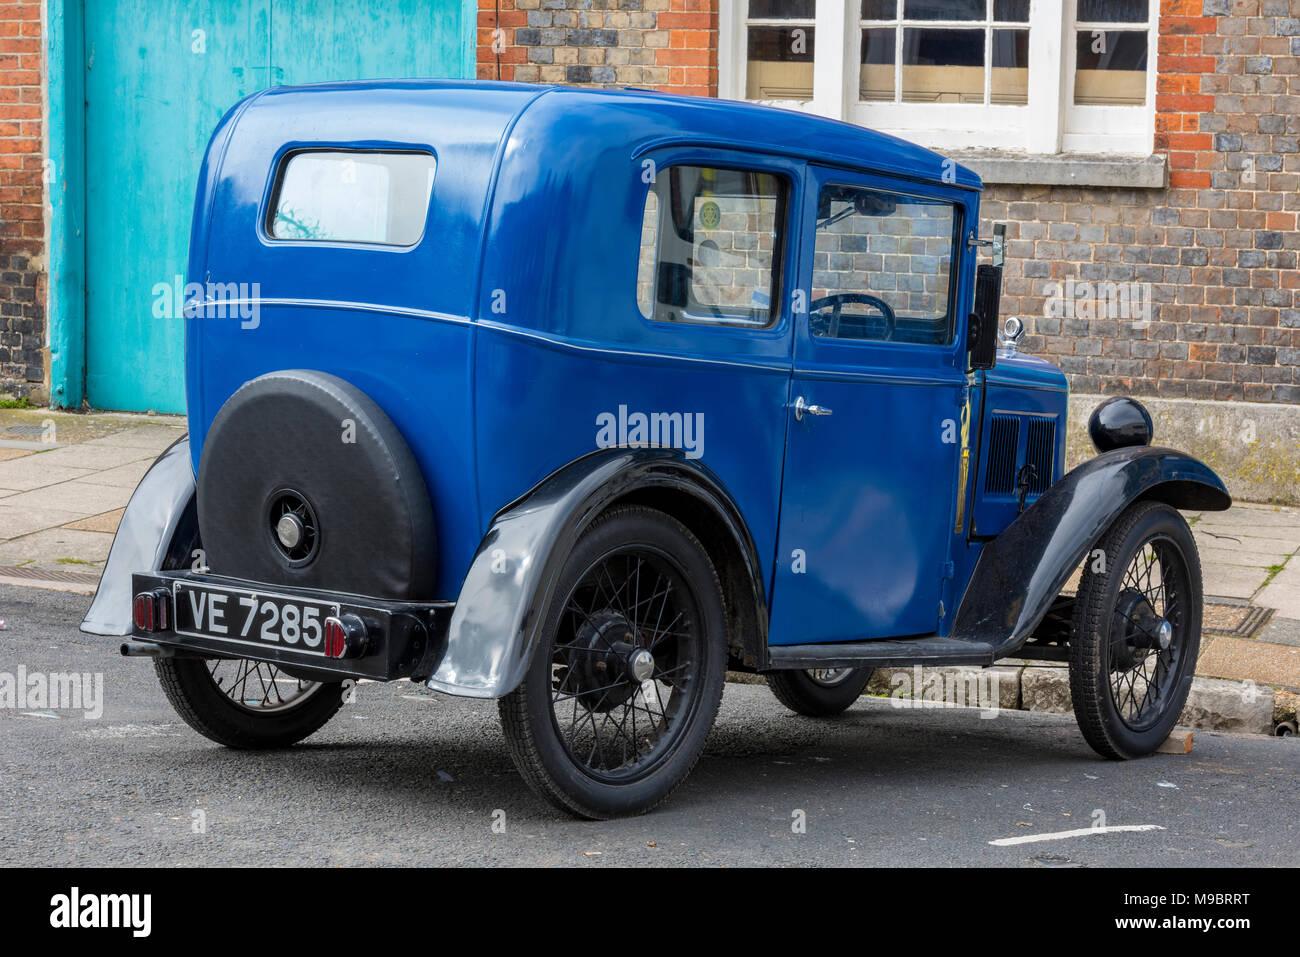 Olden Car Stock Photos & Olden Car Stock Images - Alamy